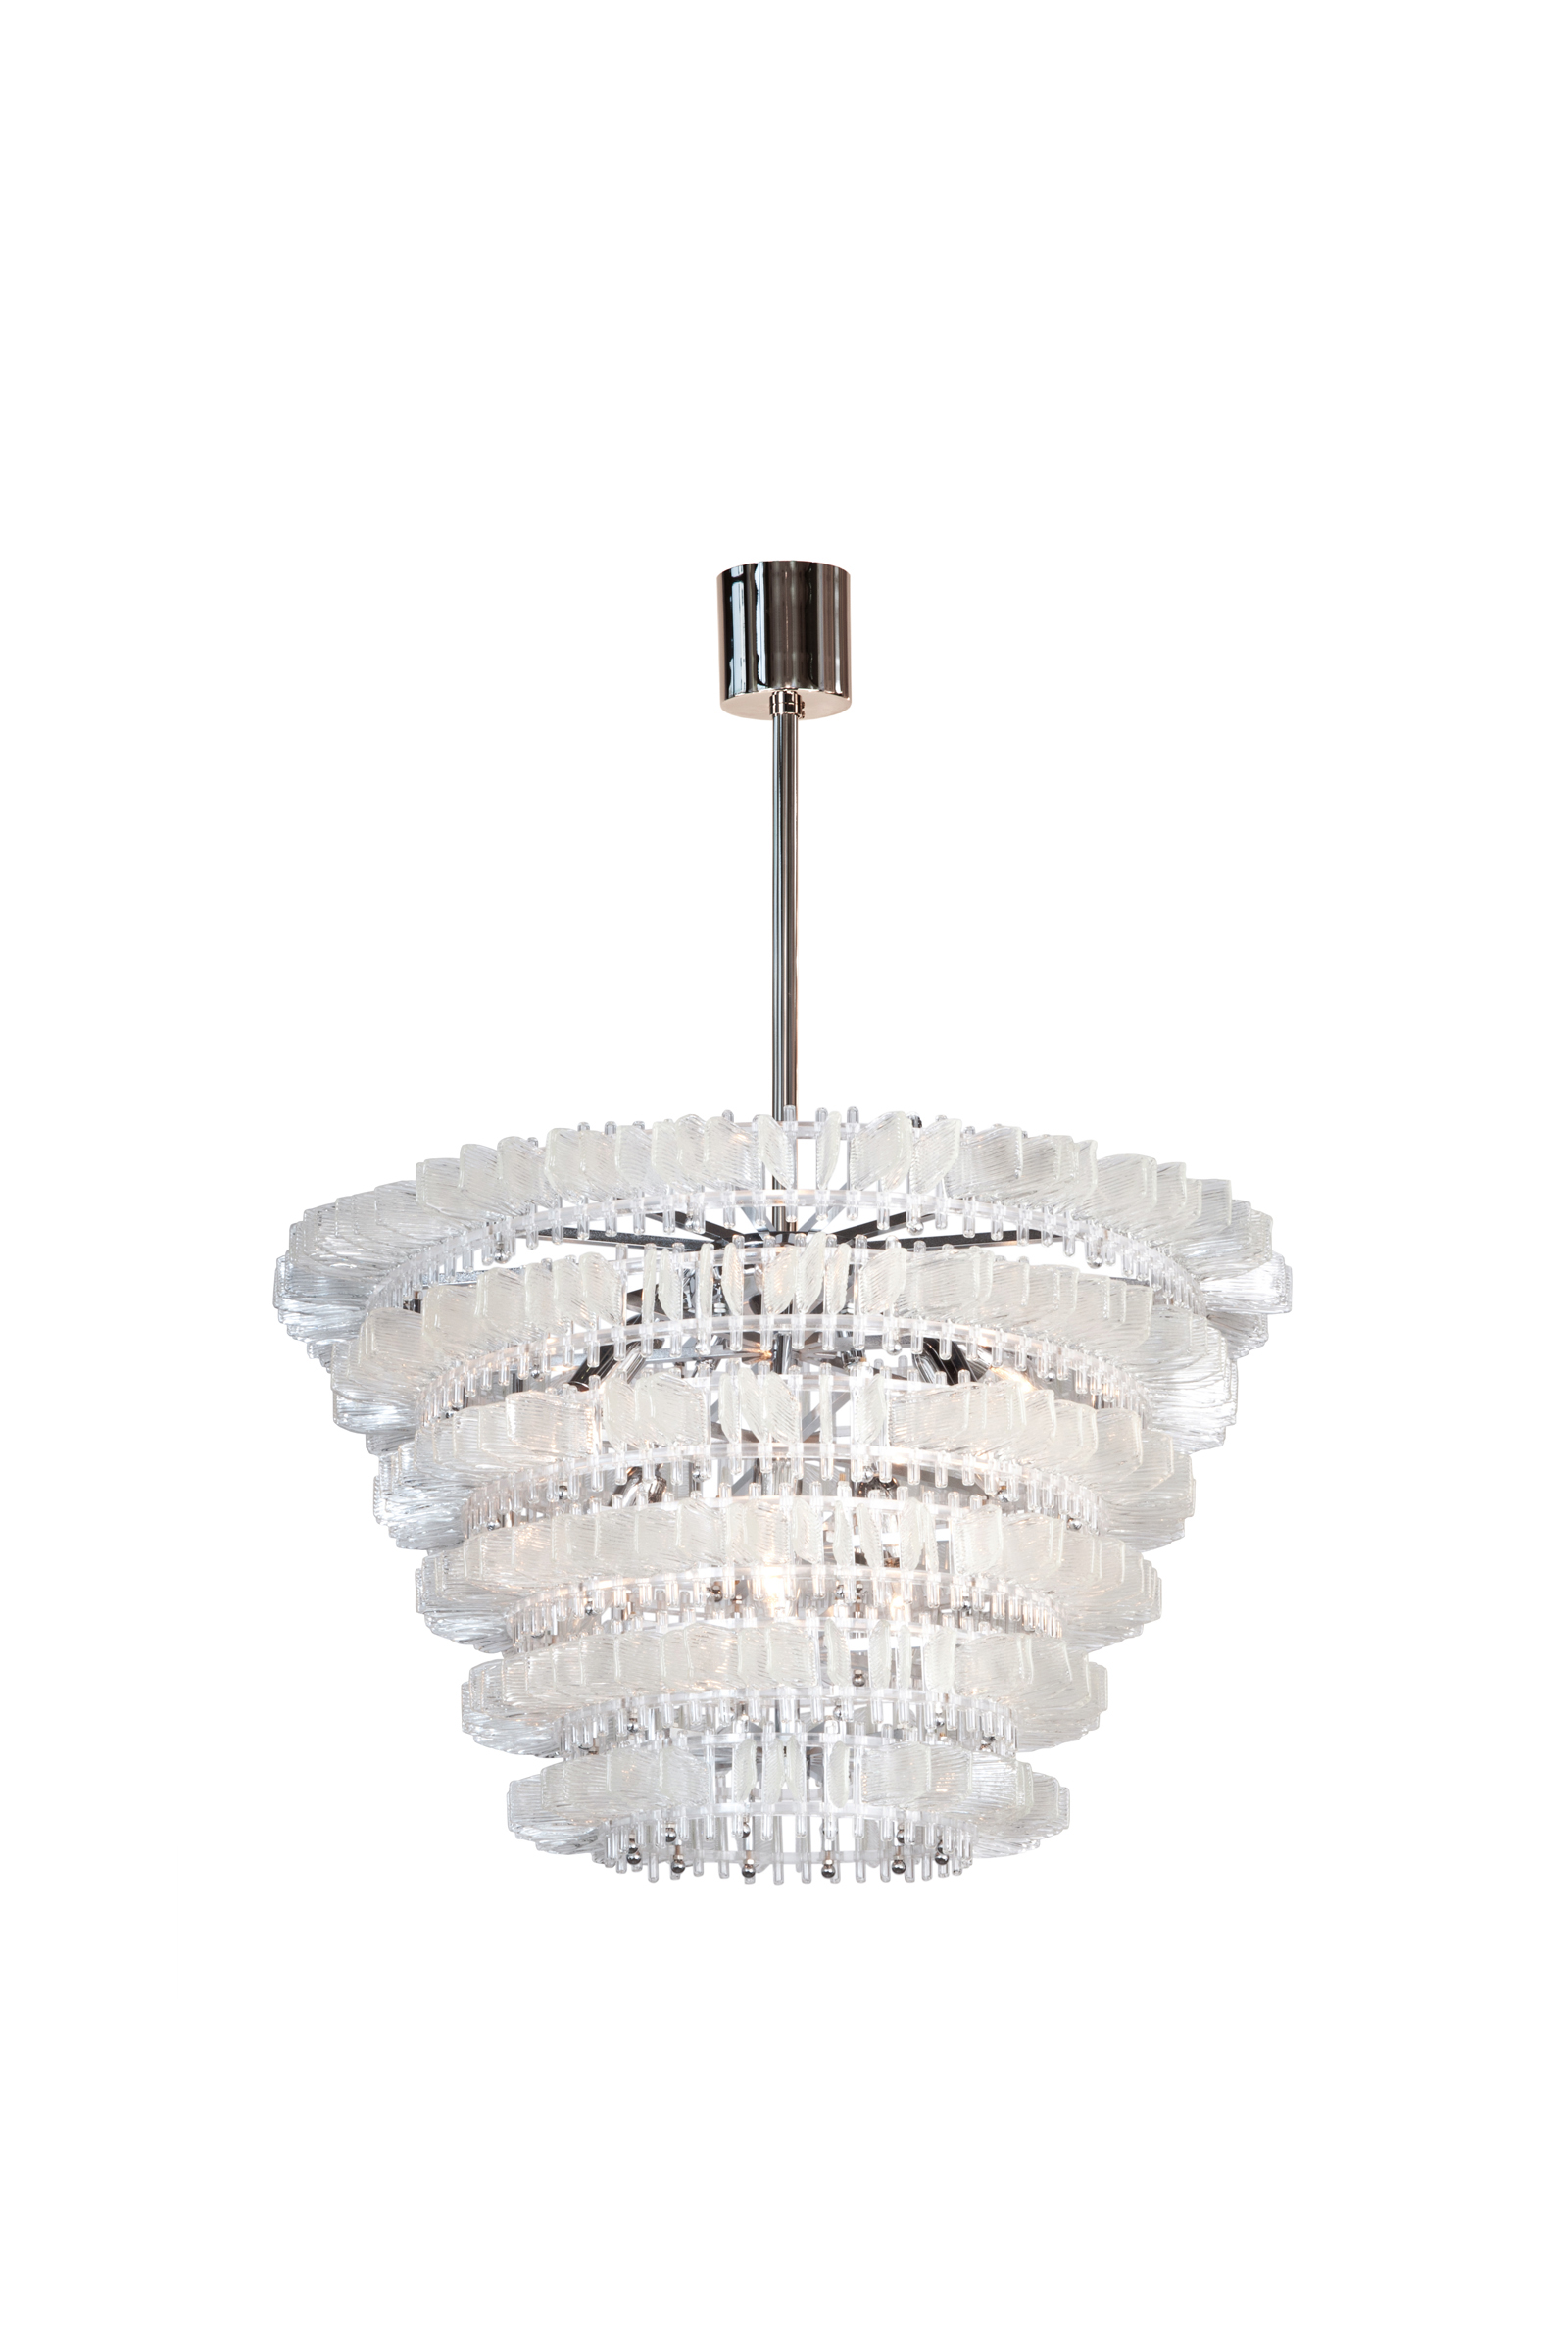 anemone-plafonnier-ceiling-veronese-tal-lancman-maurizio-galante-15.jpg